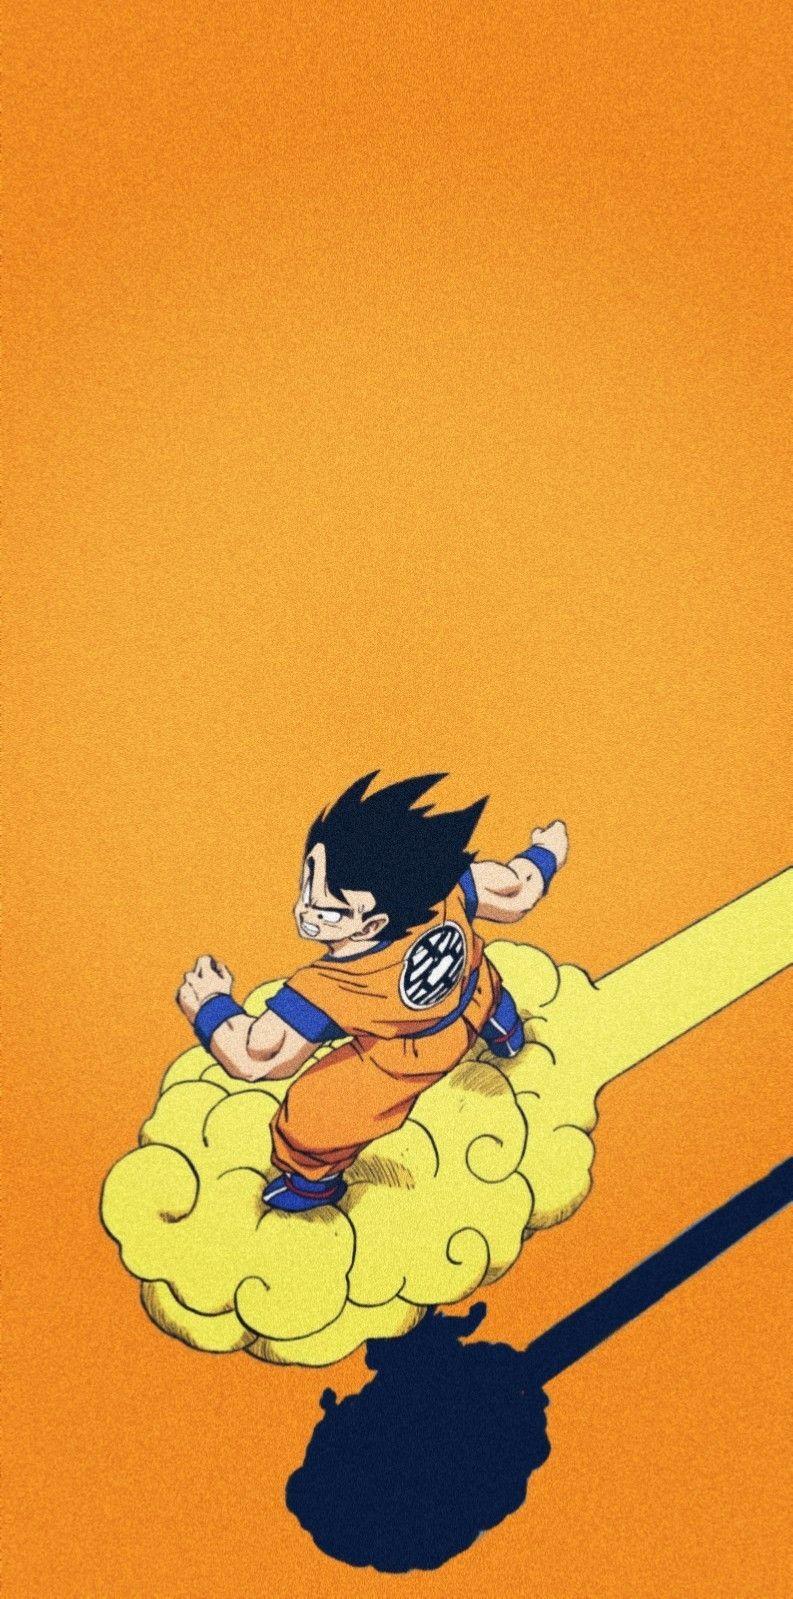 Goku Wallpaper By Raidentadashi In 2020 Dragon Ball Painting Dragon Ball Wallpapers Goku Wallpaper